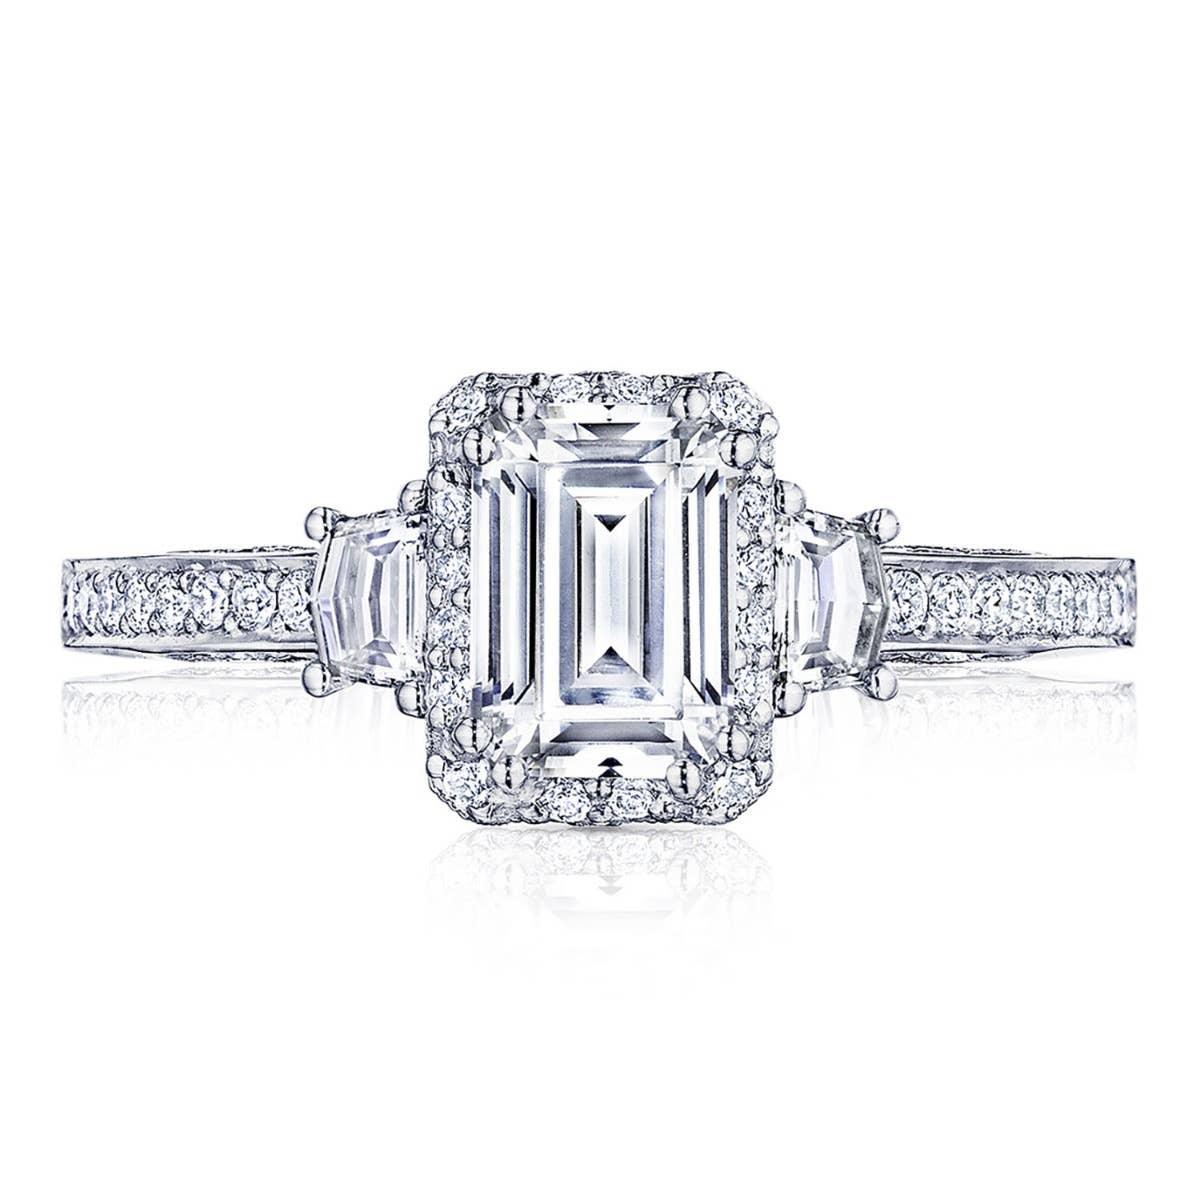 Tacori Engagement Rings - 2662ec